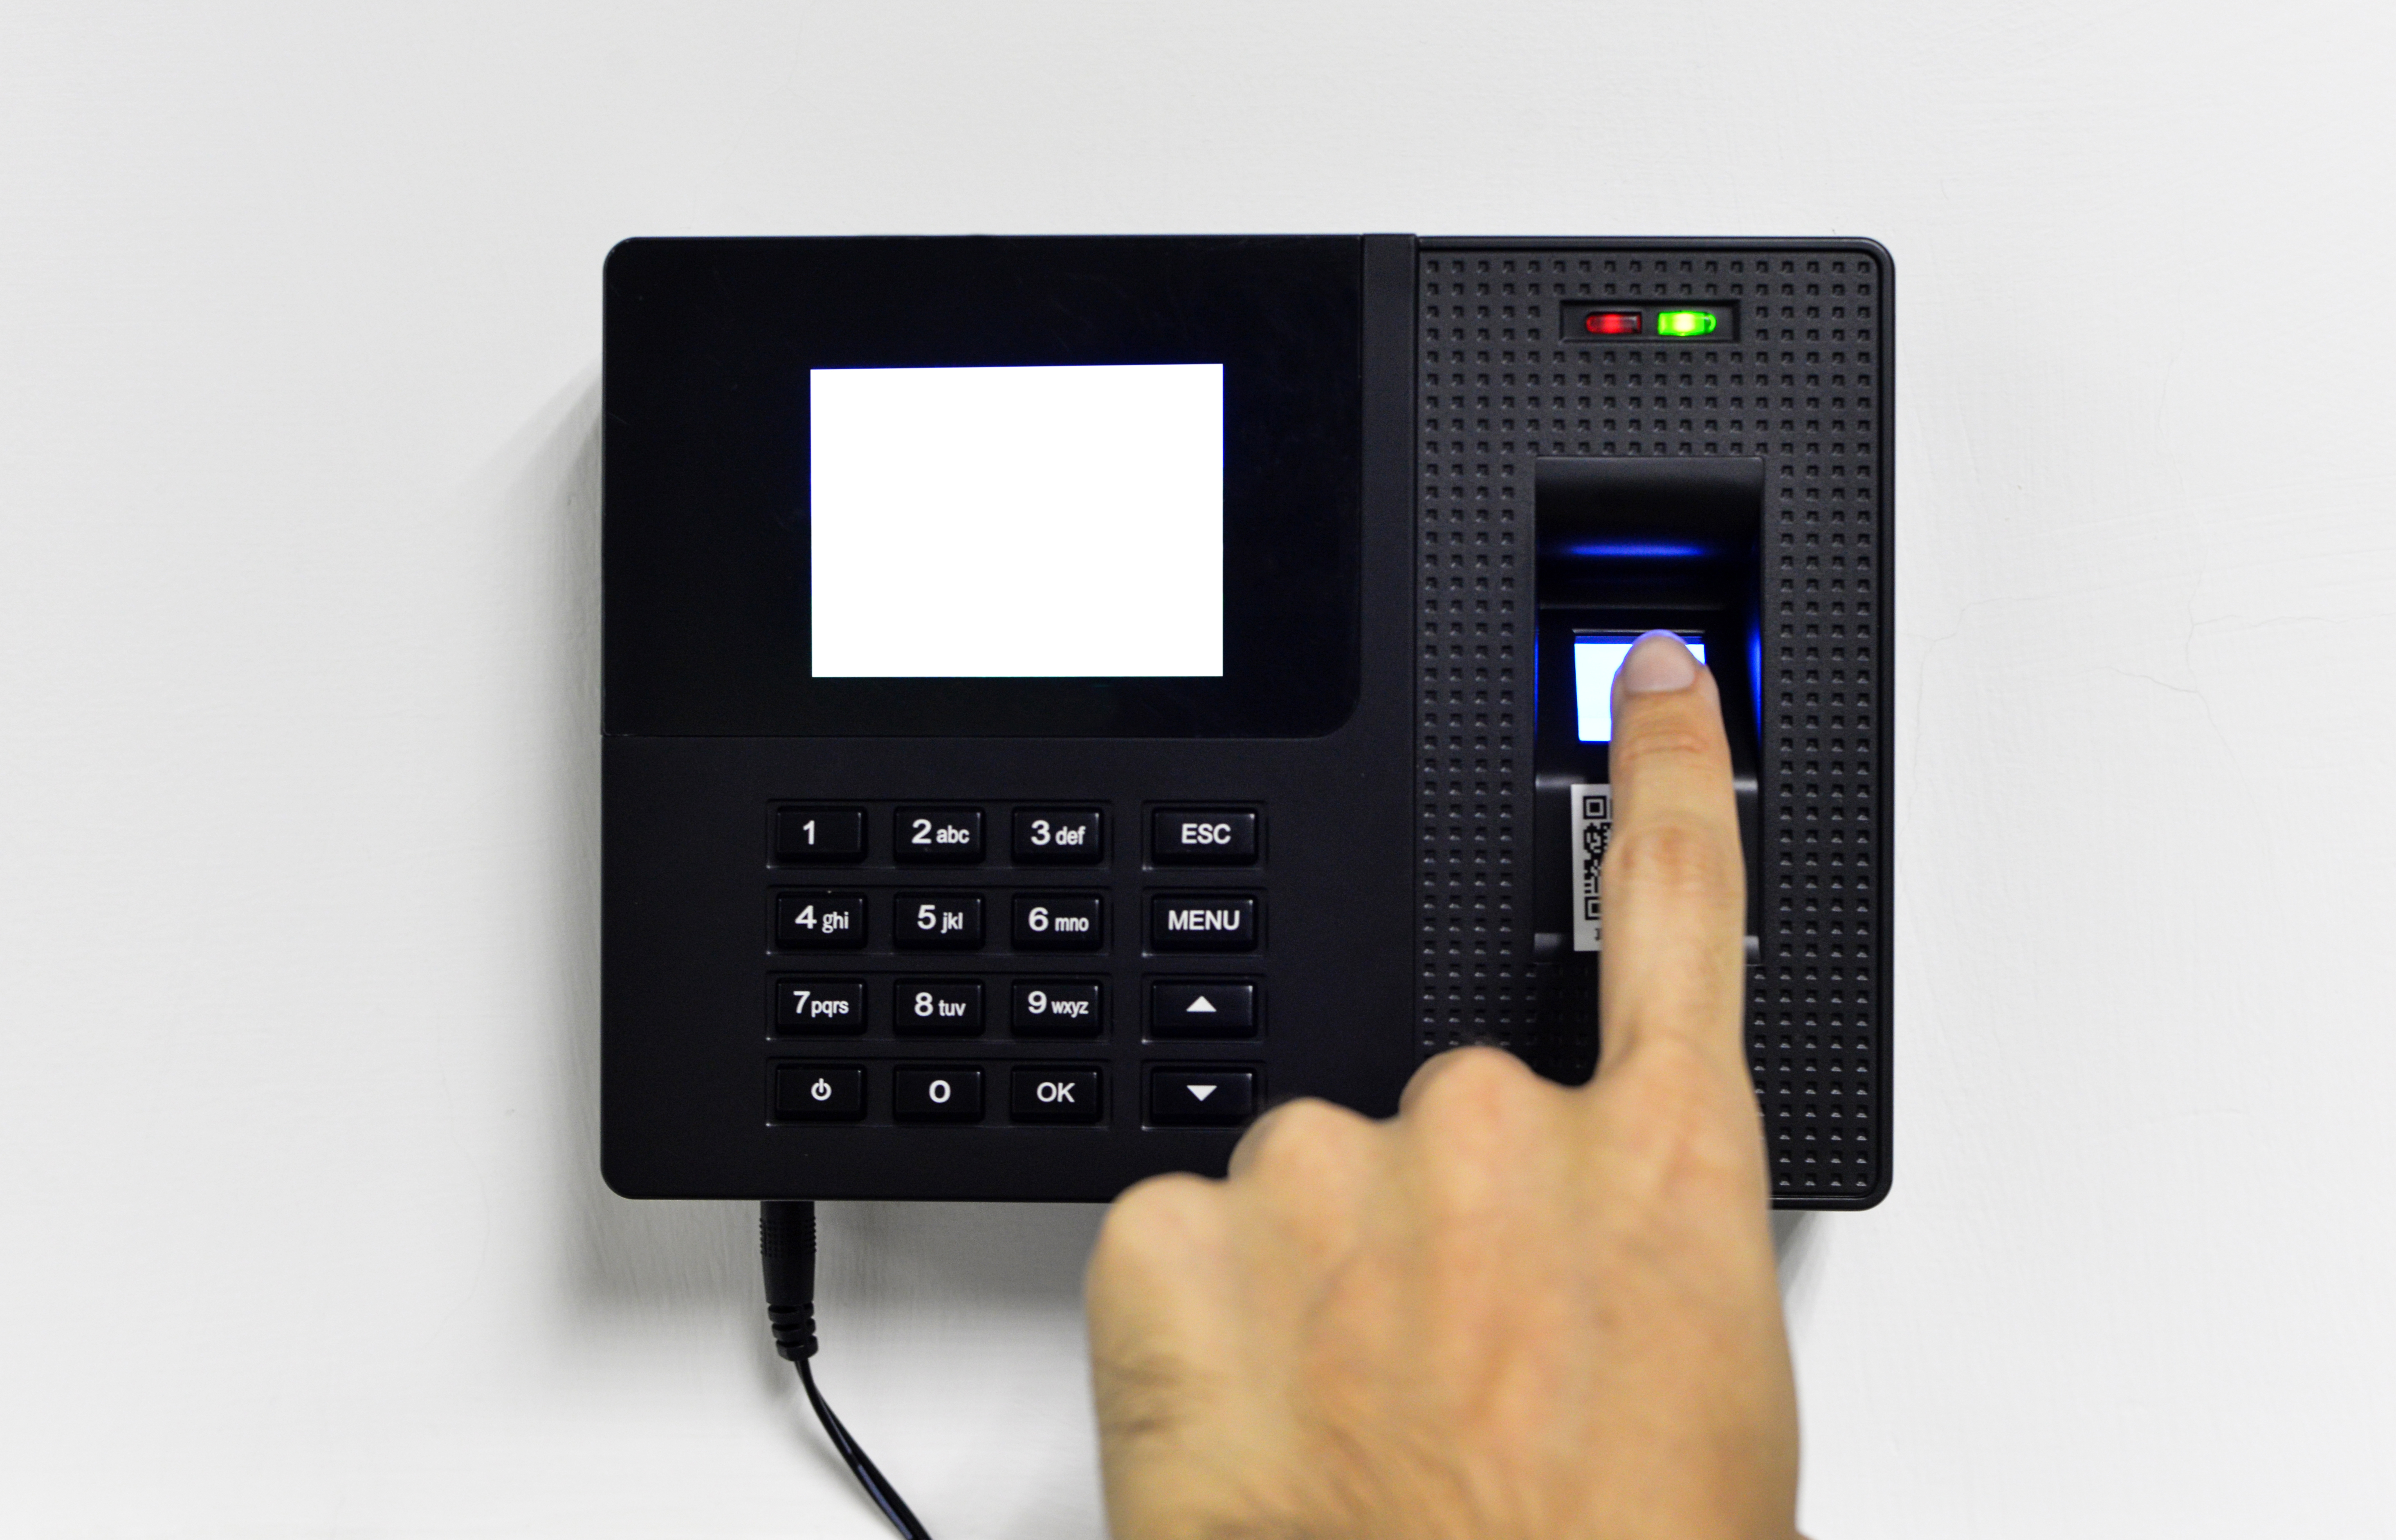 Lettore di impronta digitale